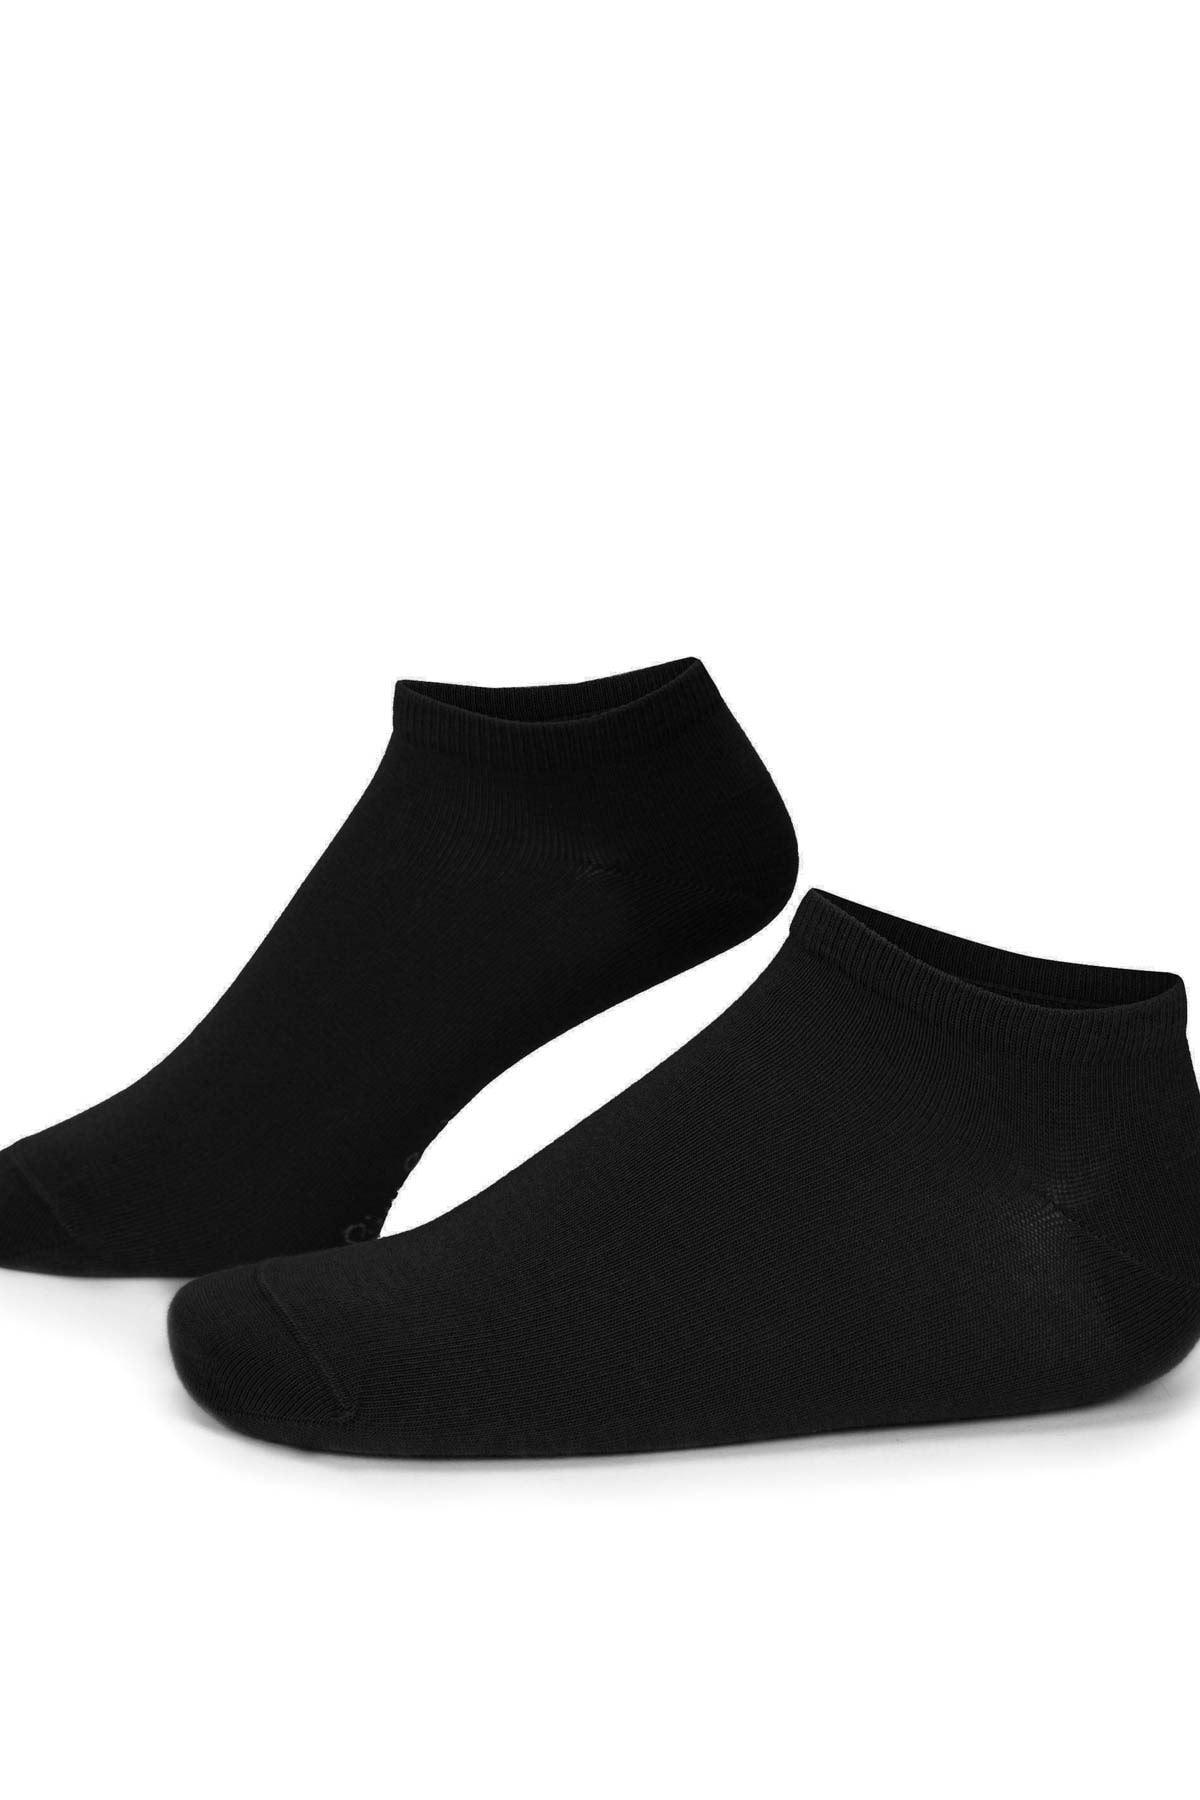 3 Adet Siyah Erkek Patik Çorap (40-44)